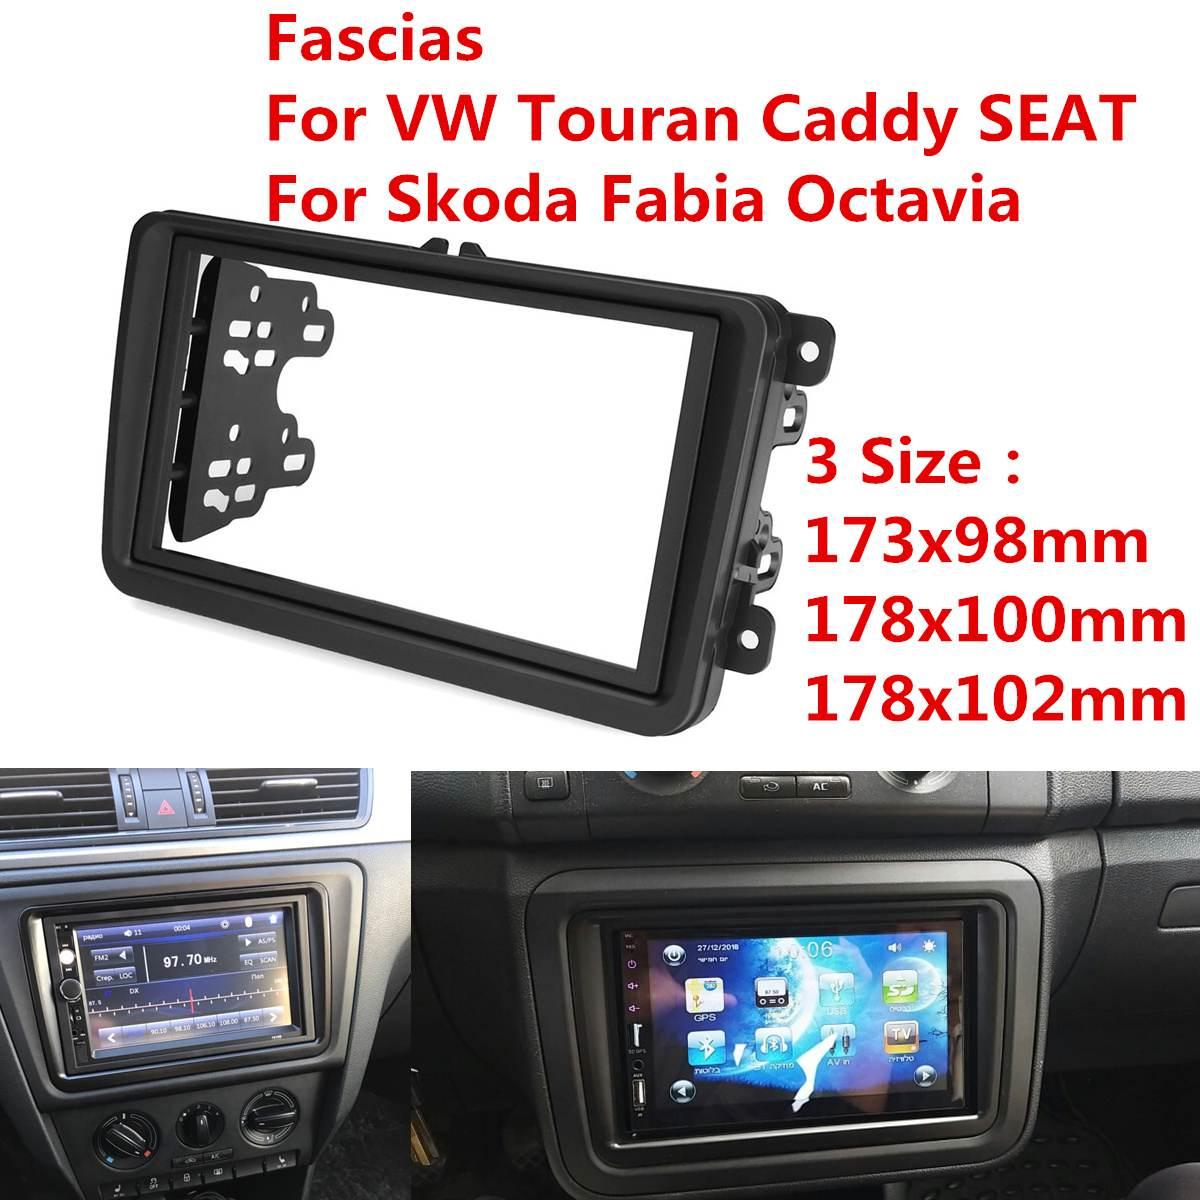 2 Din autoradio Fascia panneau cadre CD DVD Dash Audio intérieur pour Volkswagen VW Touran Caddy siège Skoda Fabia Octavia